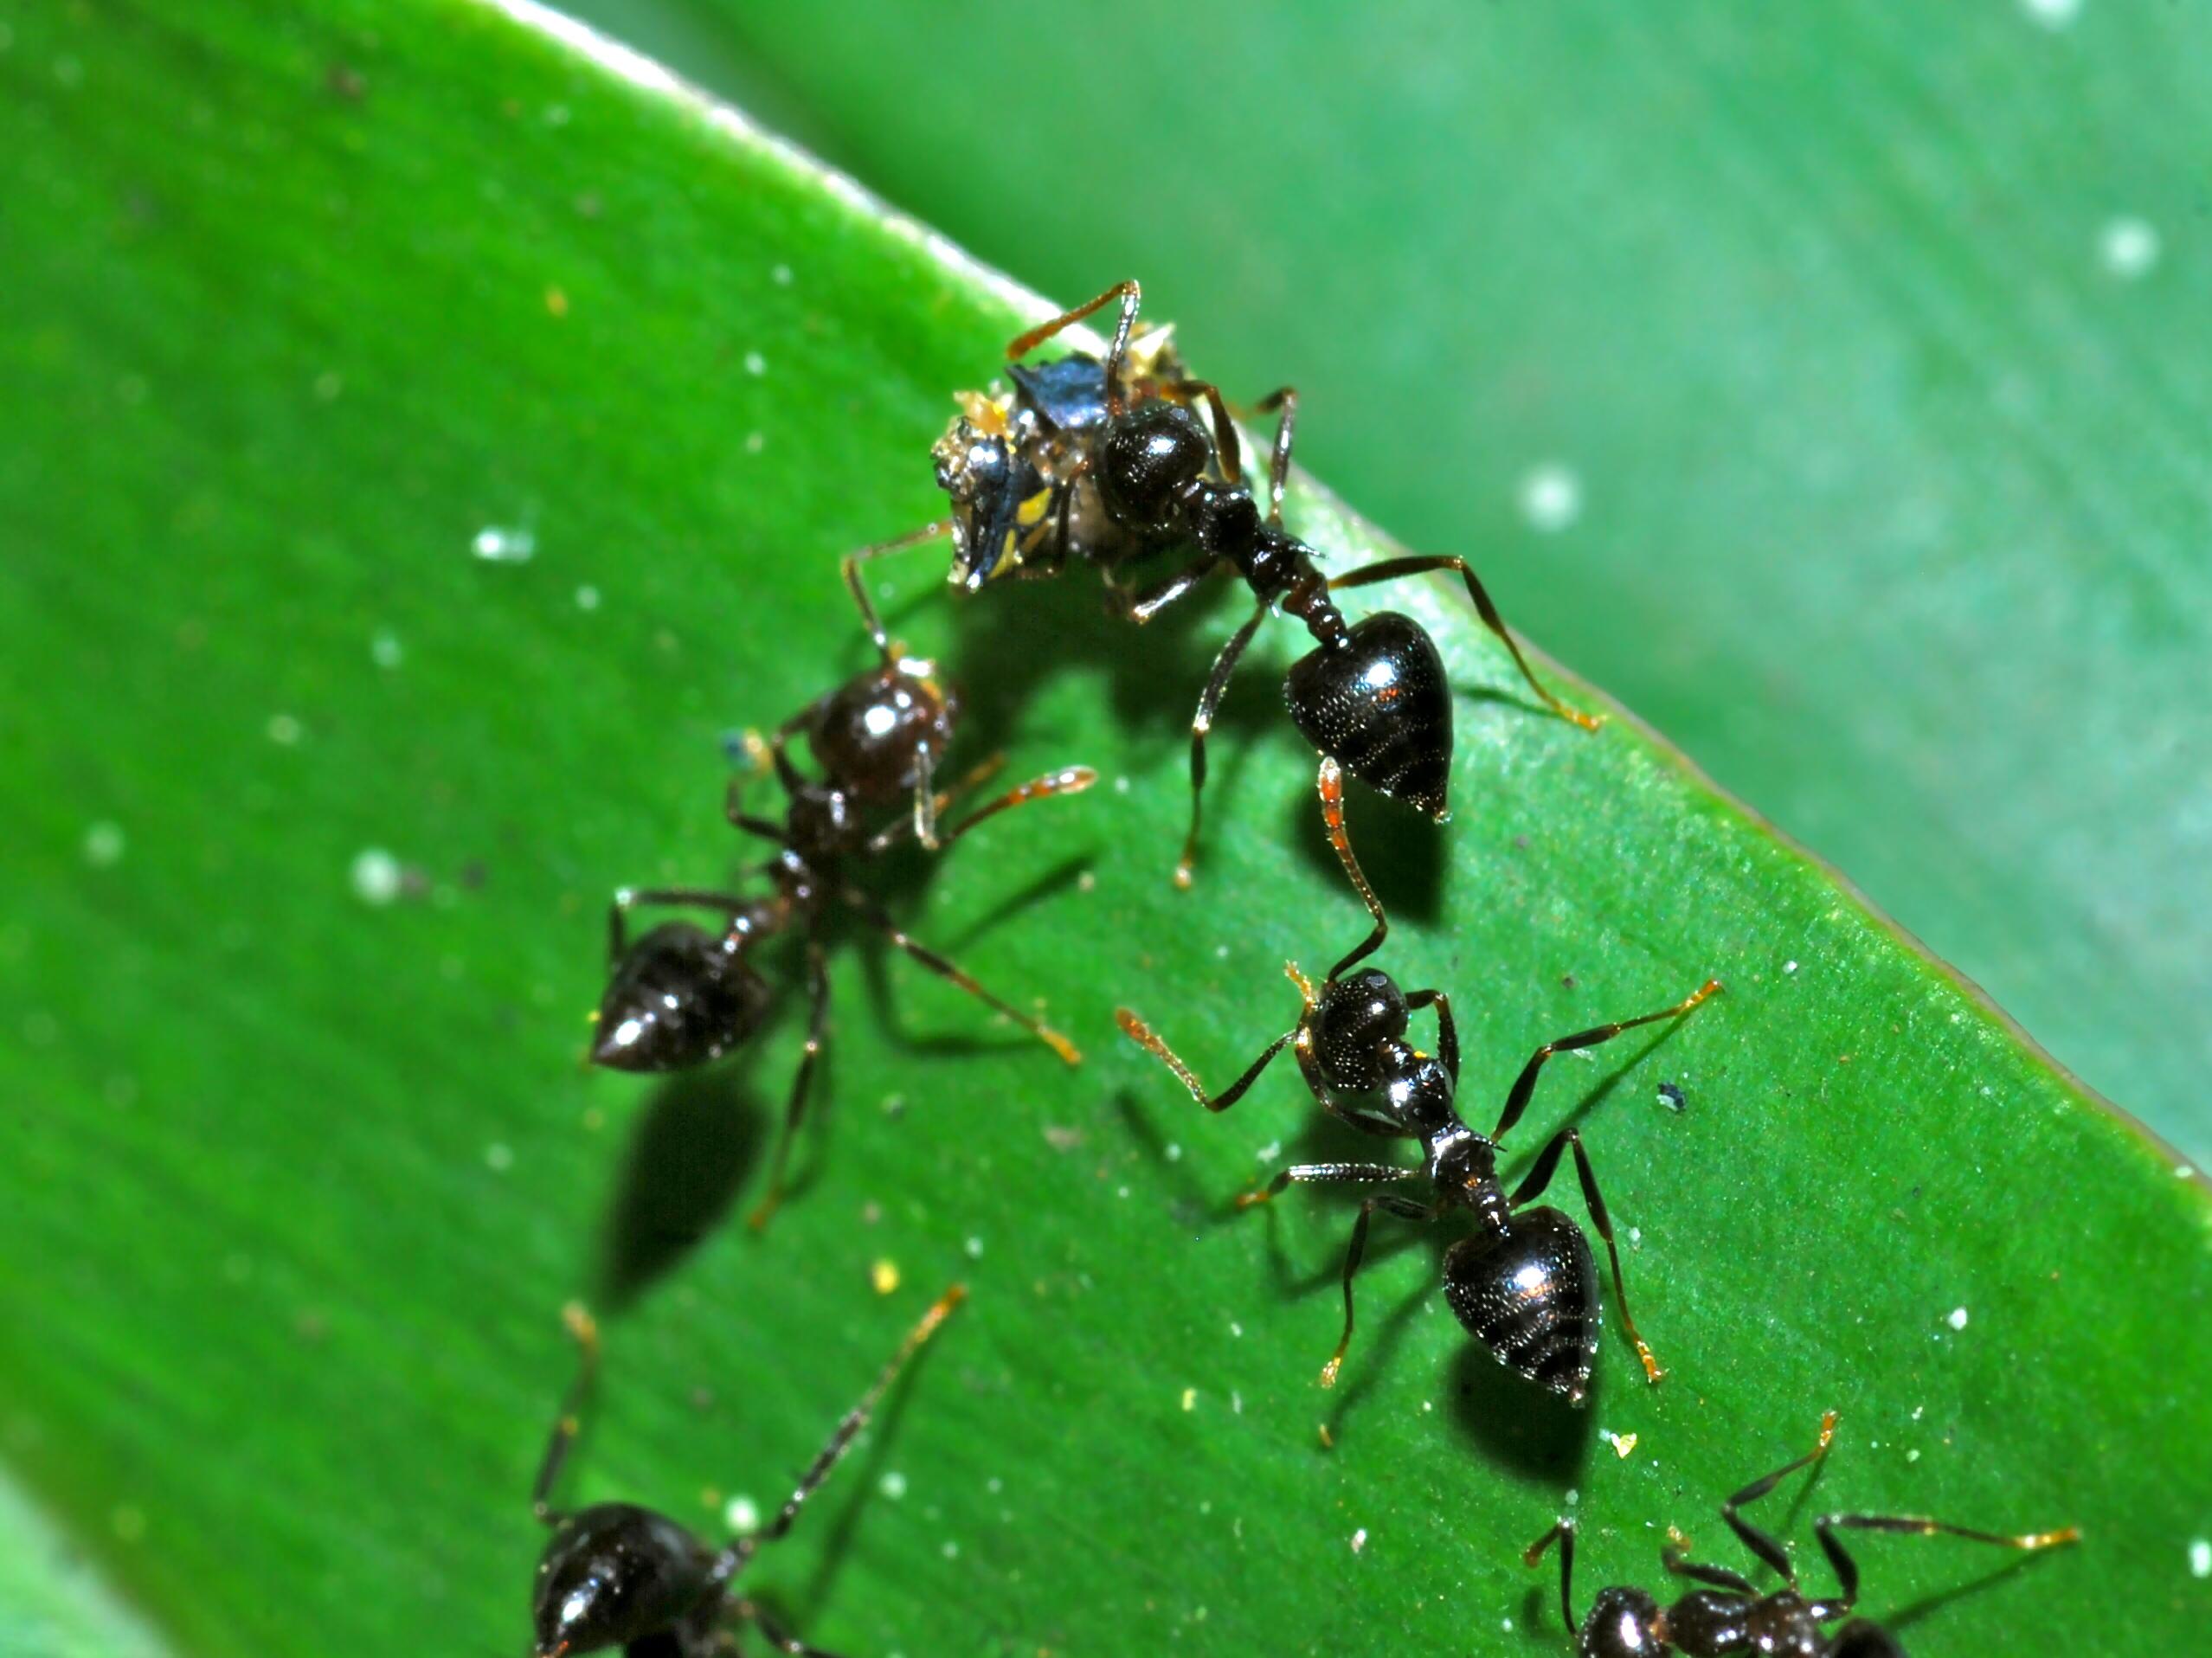 Acrobat_Ants_%28Crematogaster_sp.%29_%28